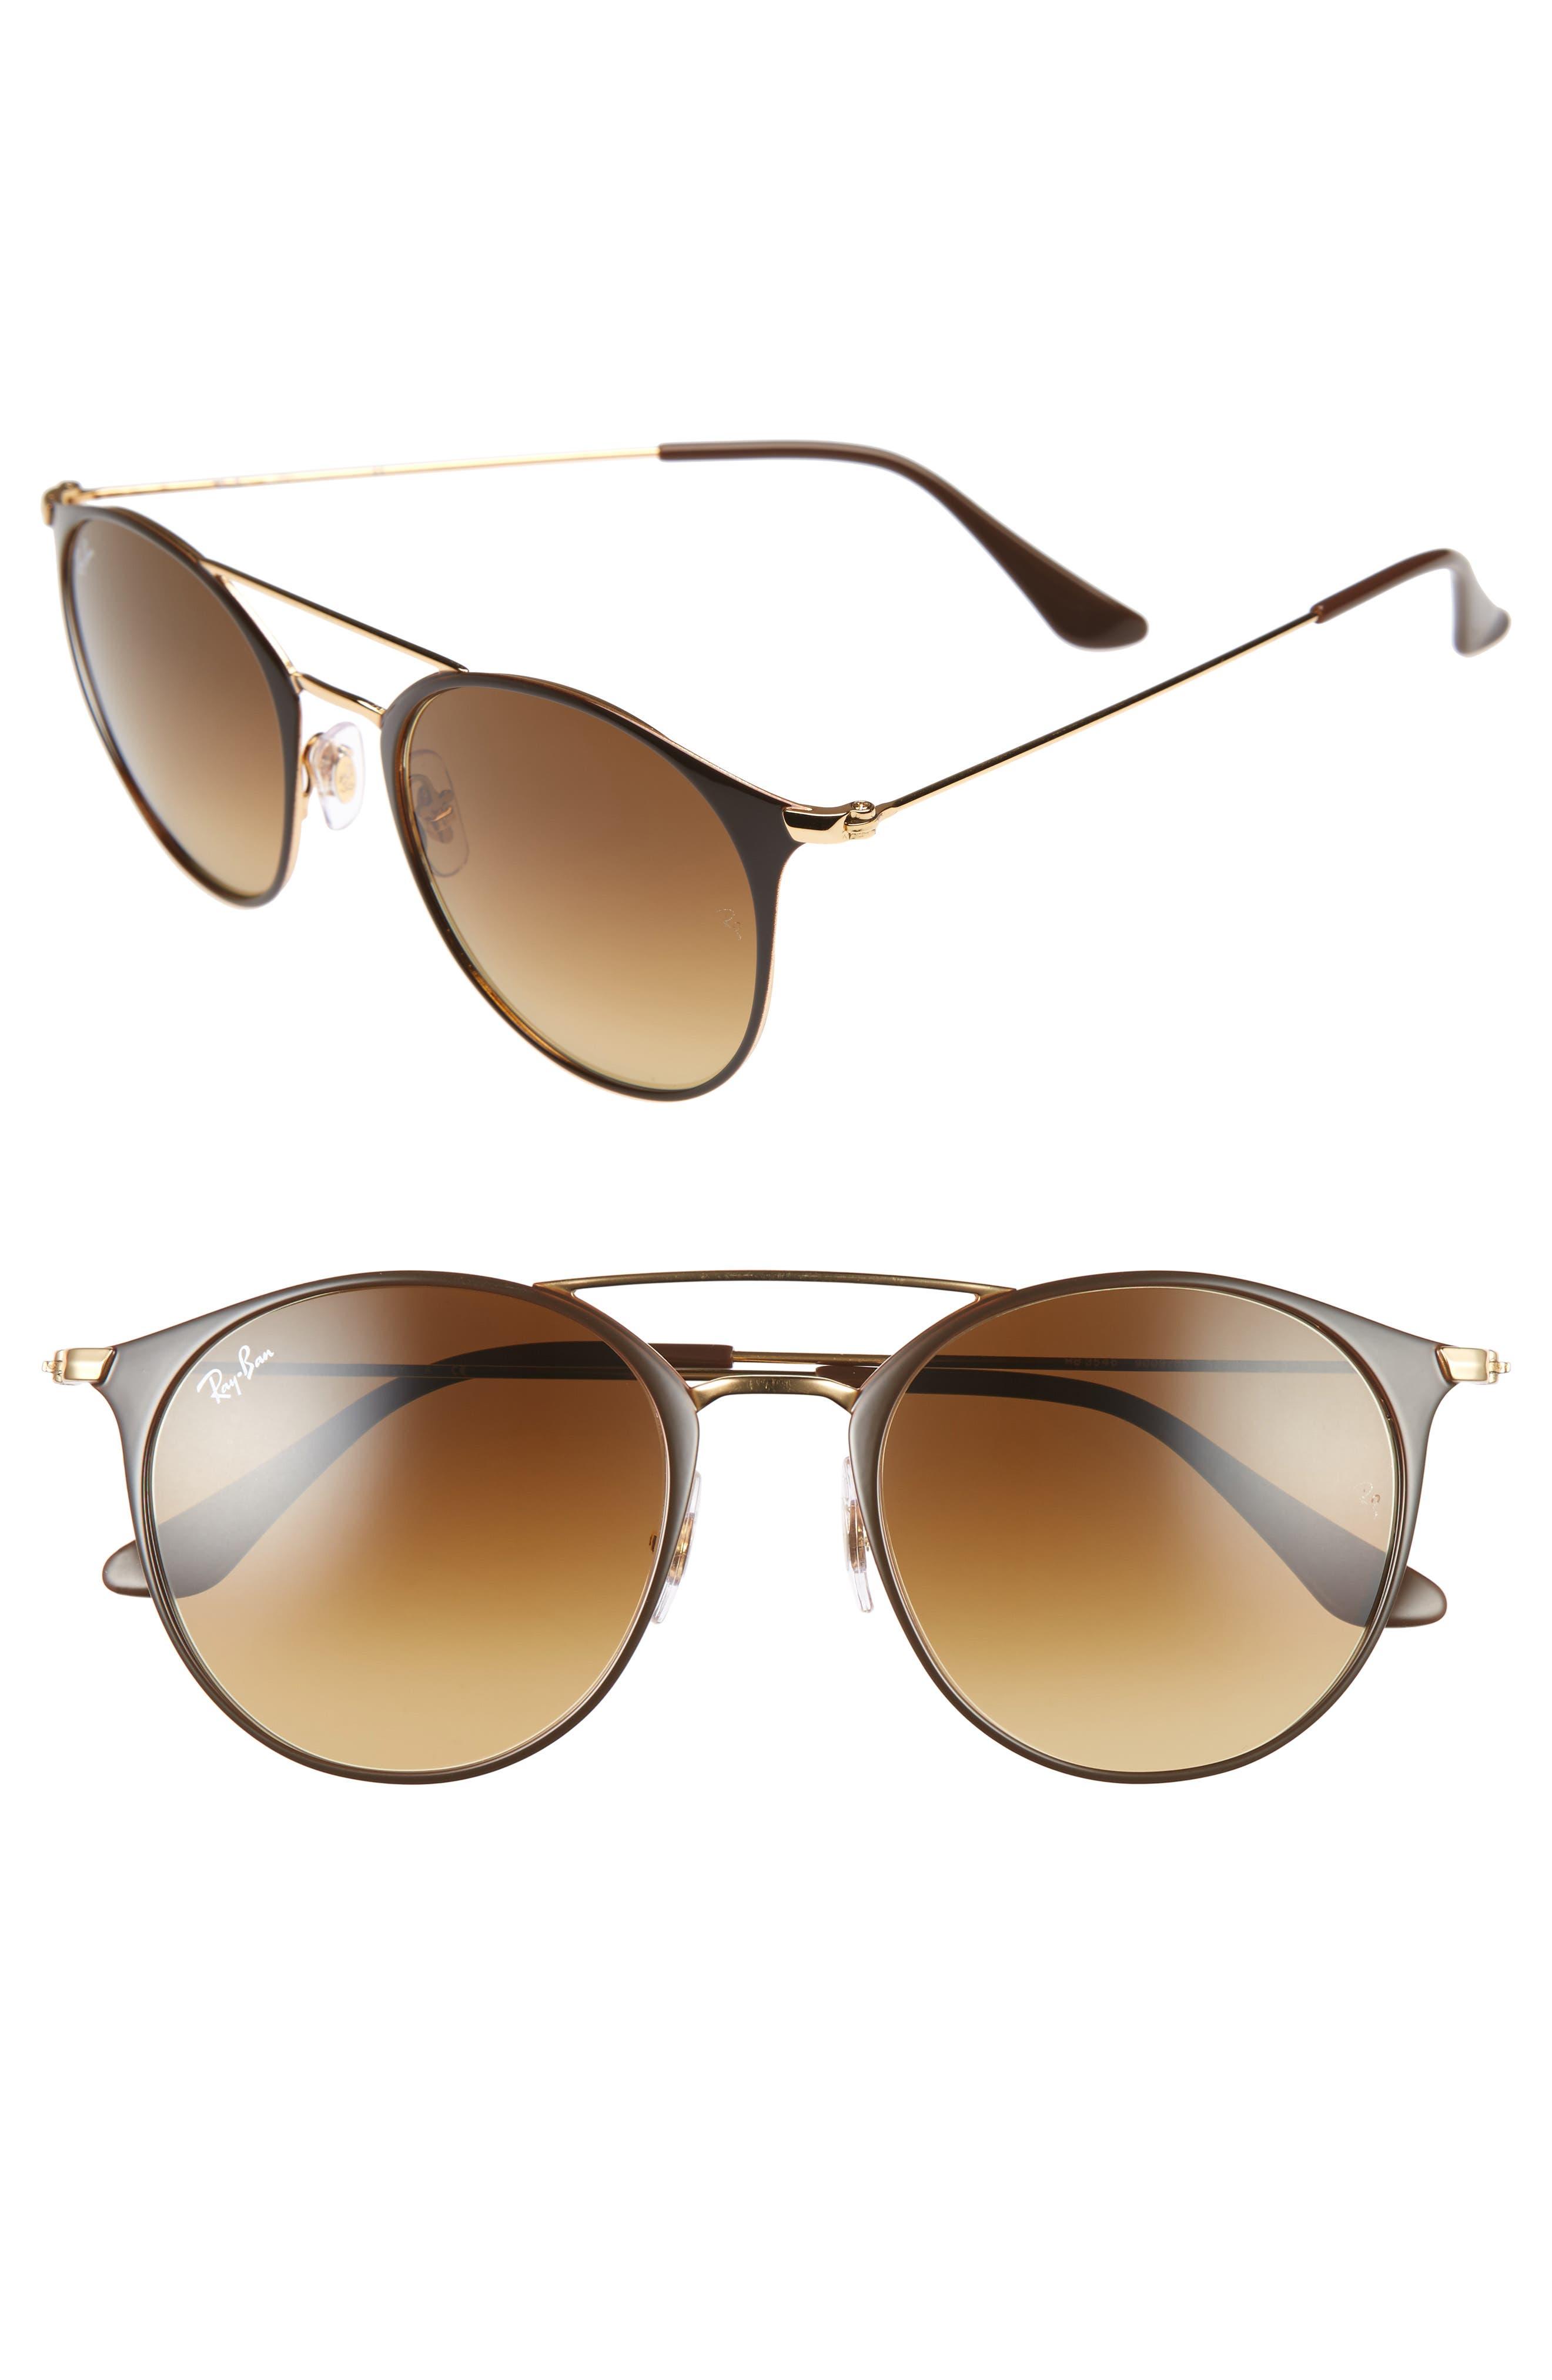 Highstreet 52mm Round Brow Bar Sunglasses,                             Main thumbnail 1, color,                             BROWN/ GOLD